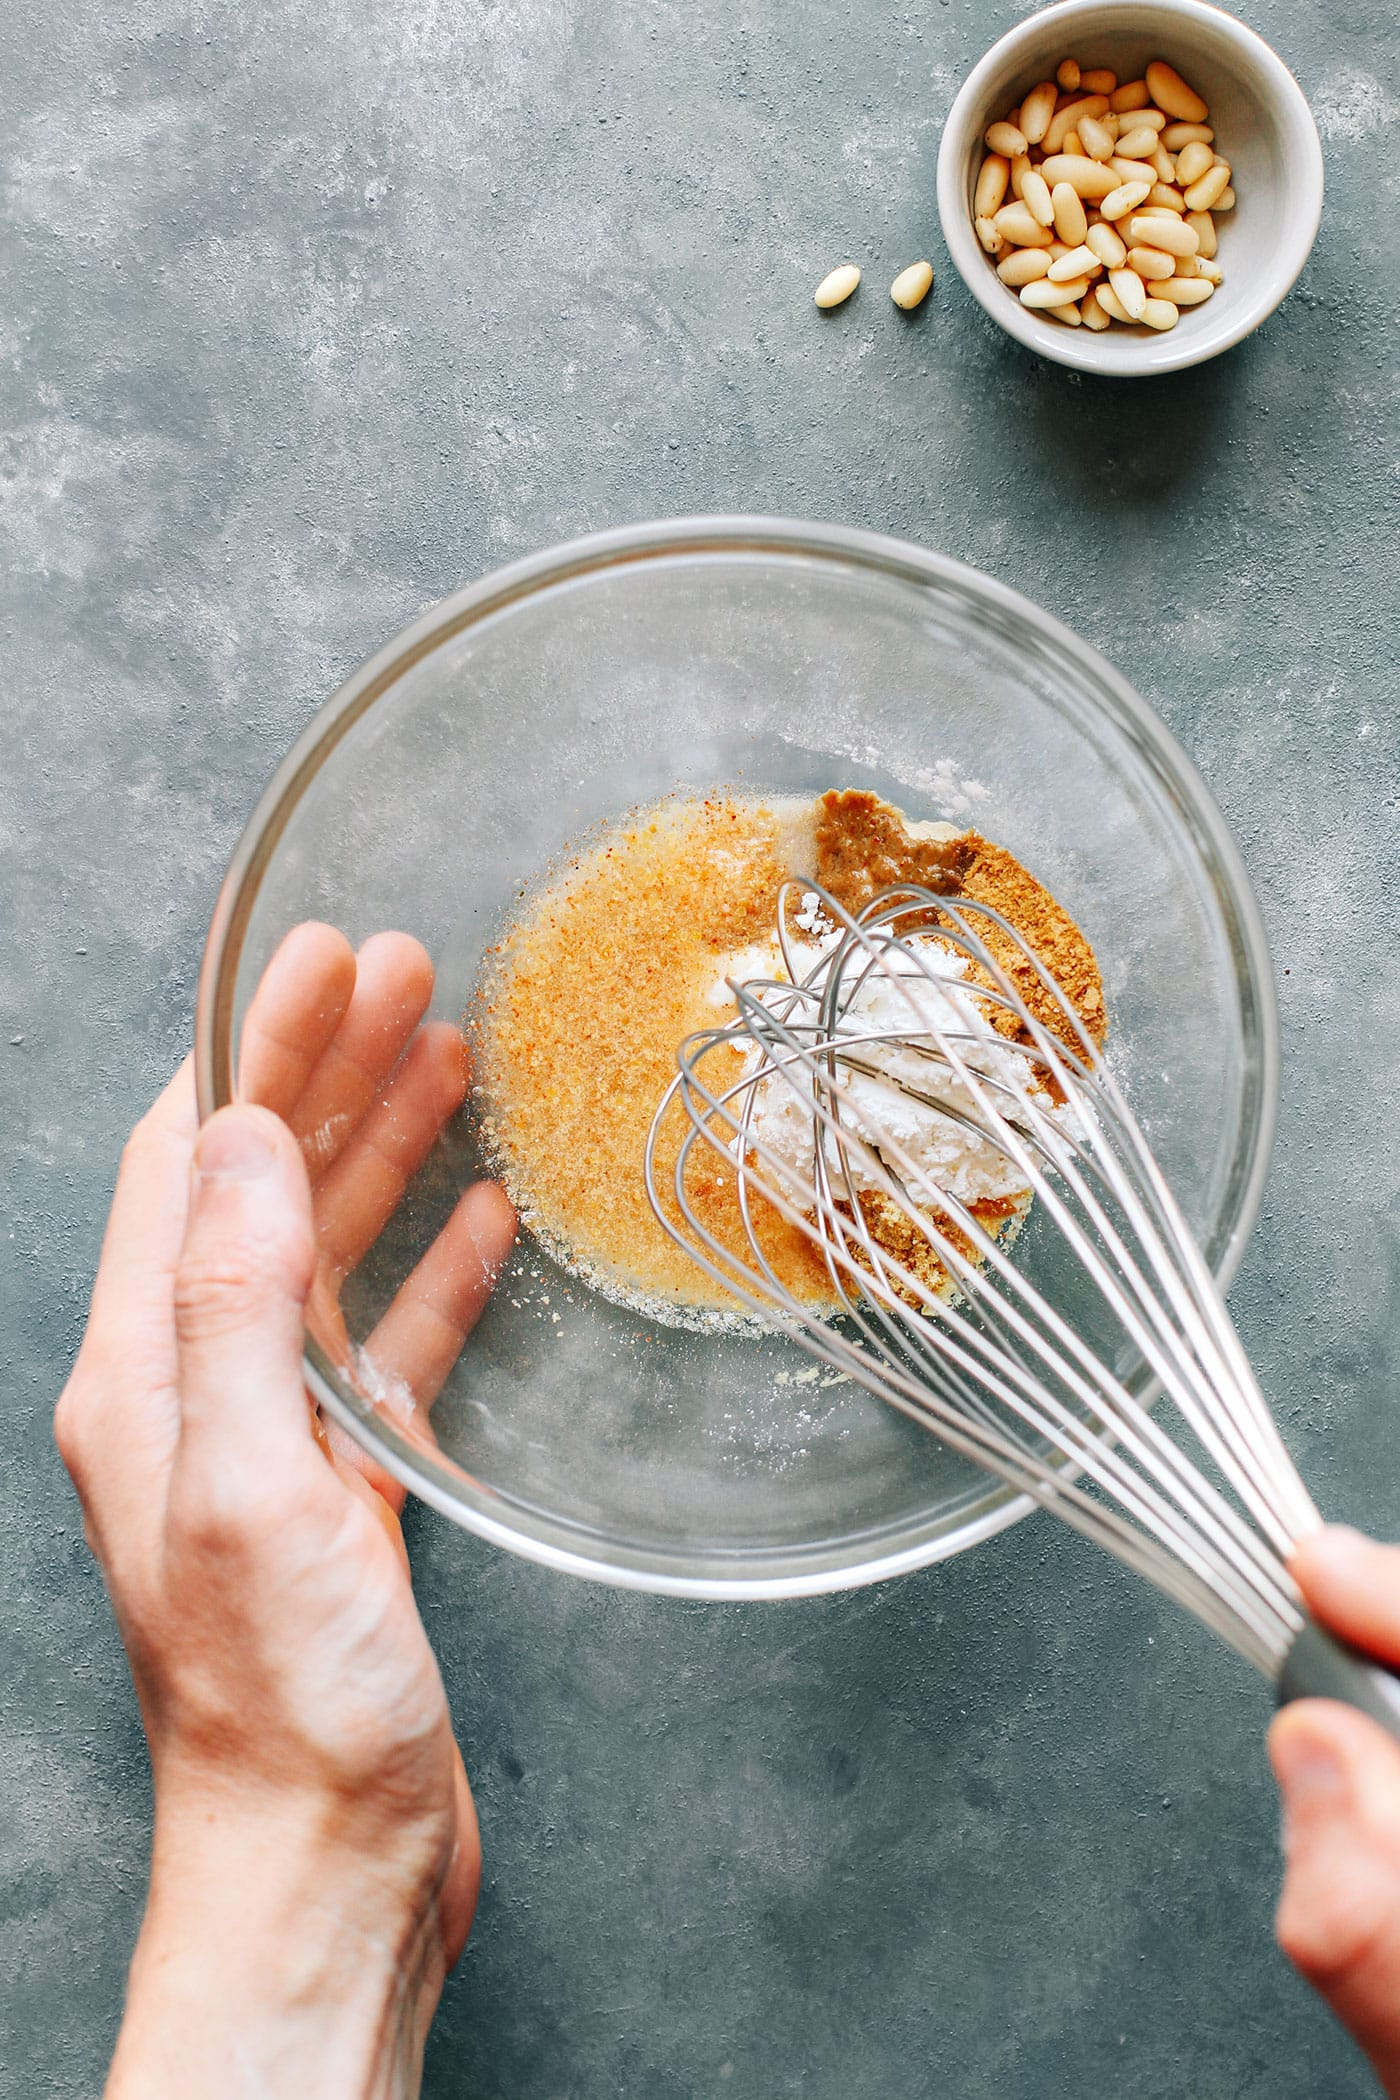 Seedy and Cheesy Tuiles (Vegan + GF)